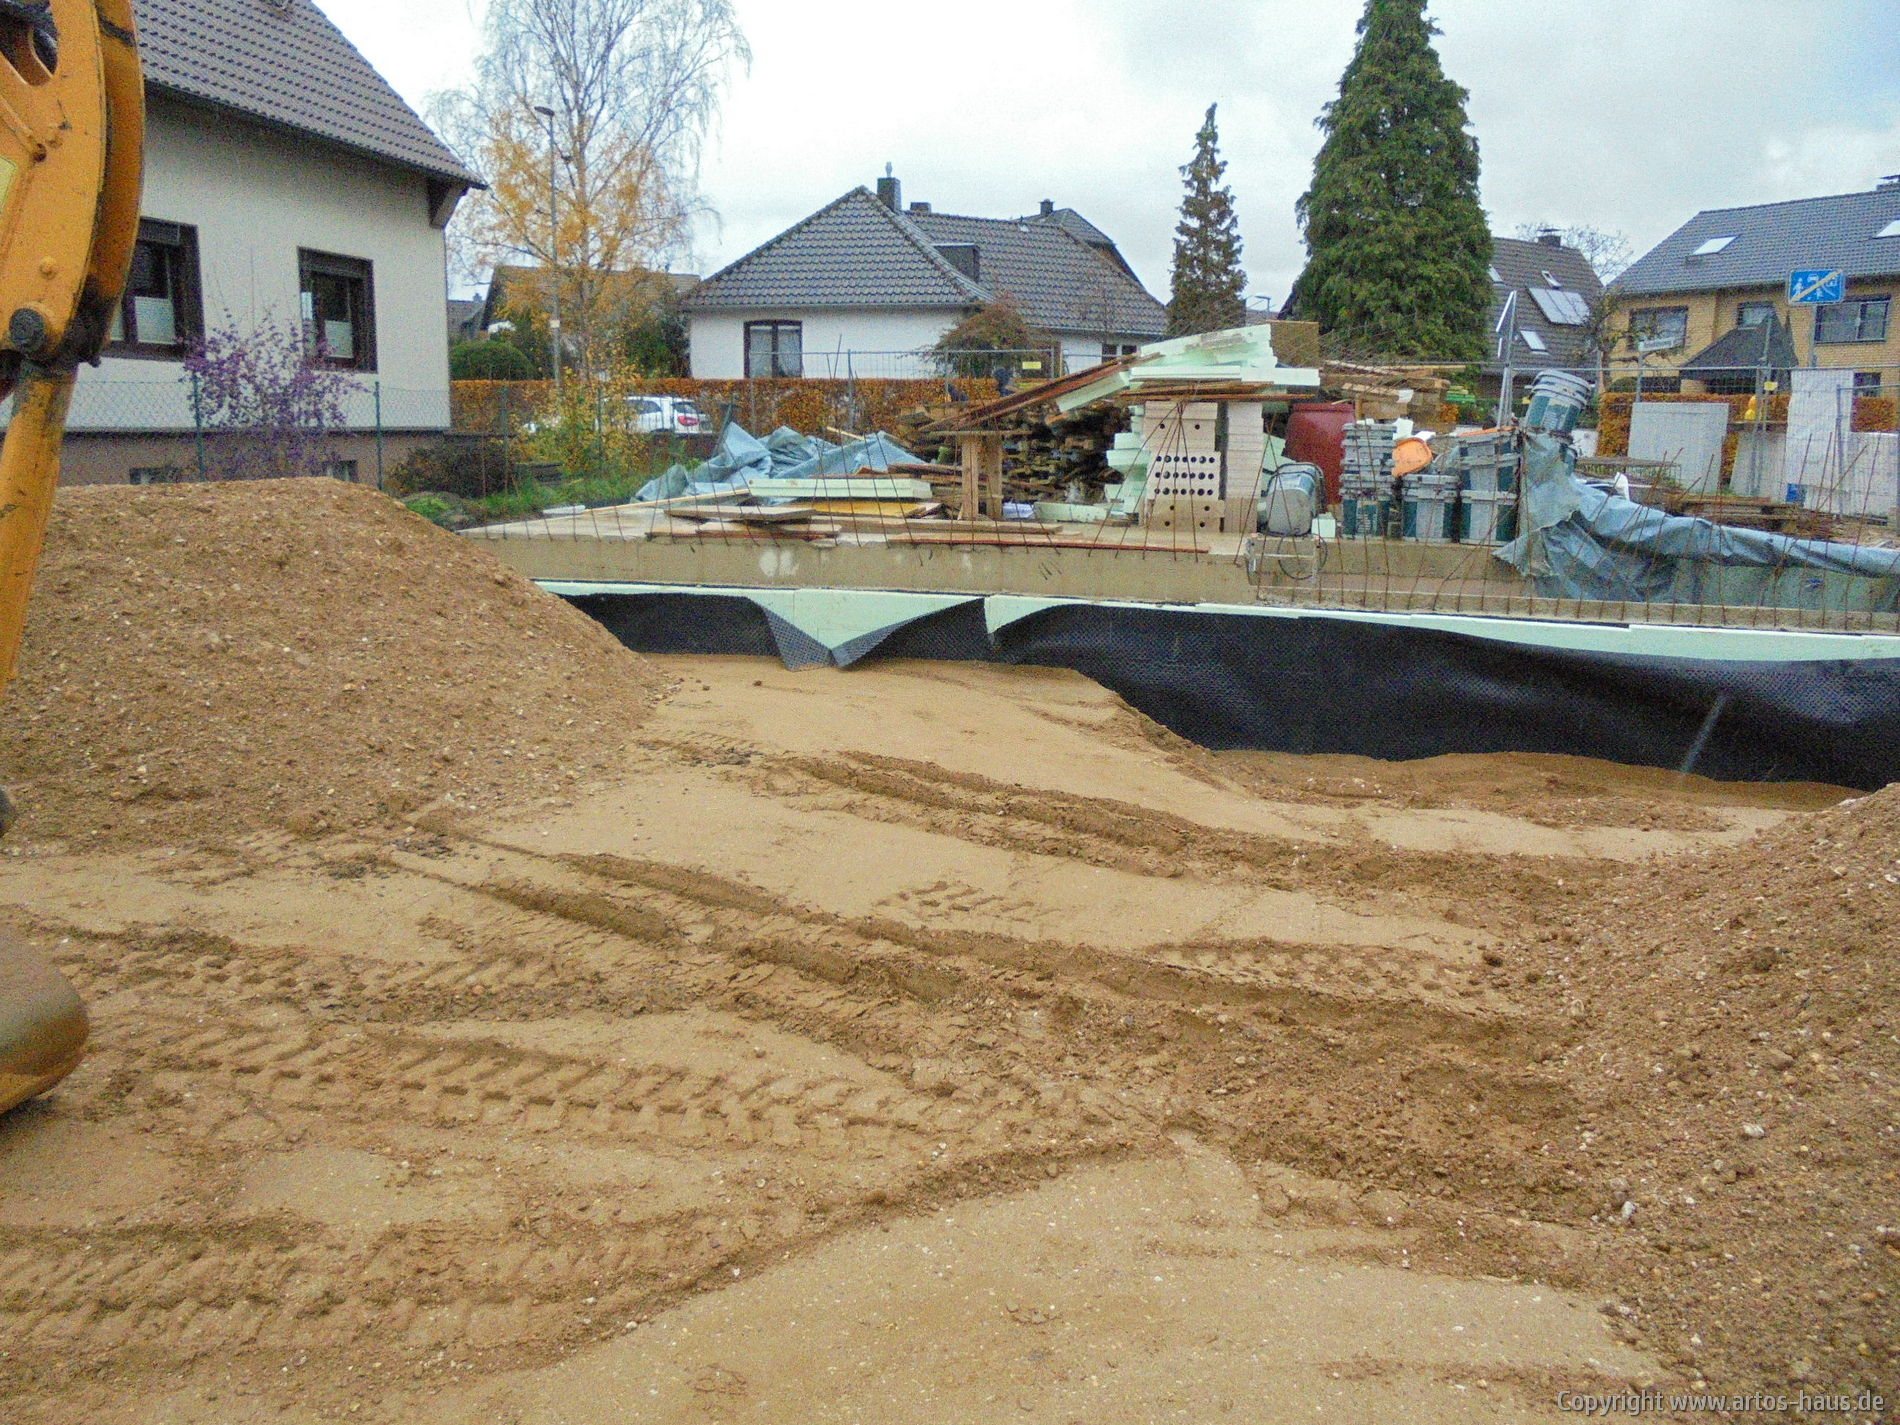 Verfüllen der Baugrube | www.artos-haus.de Bild 3